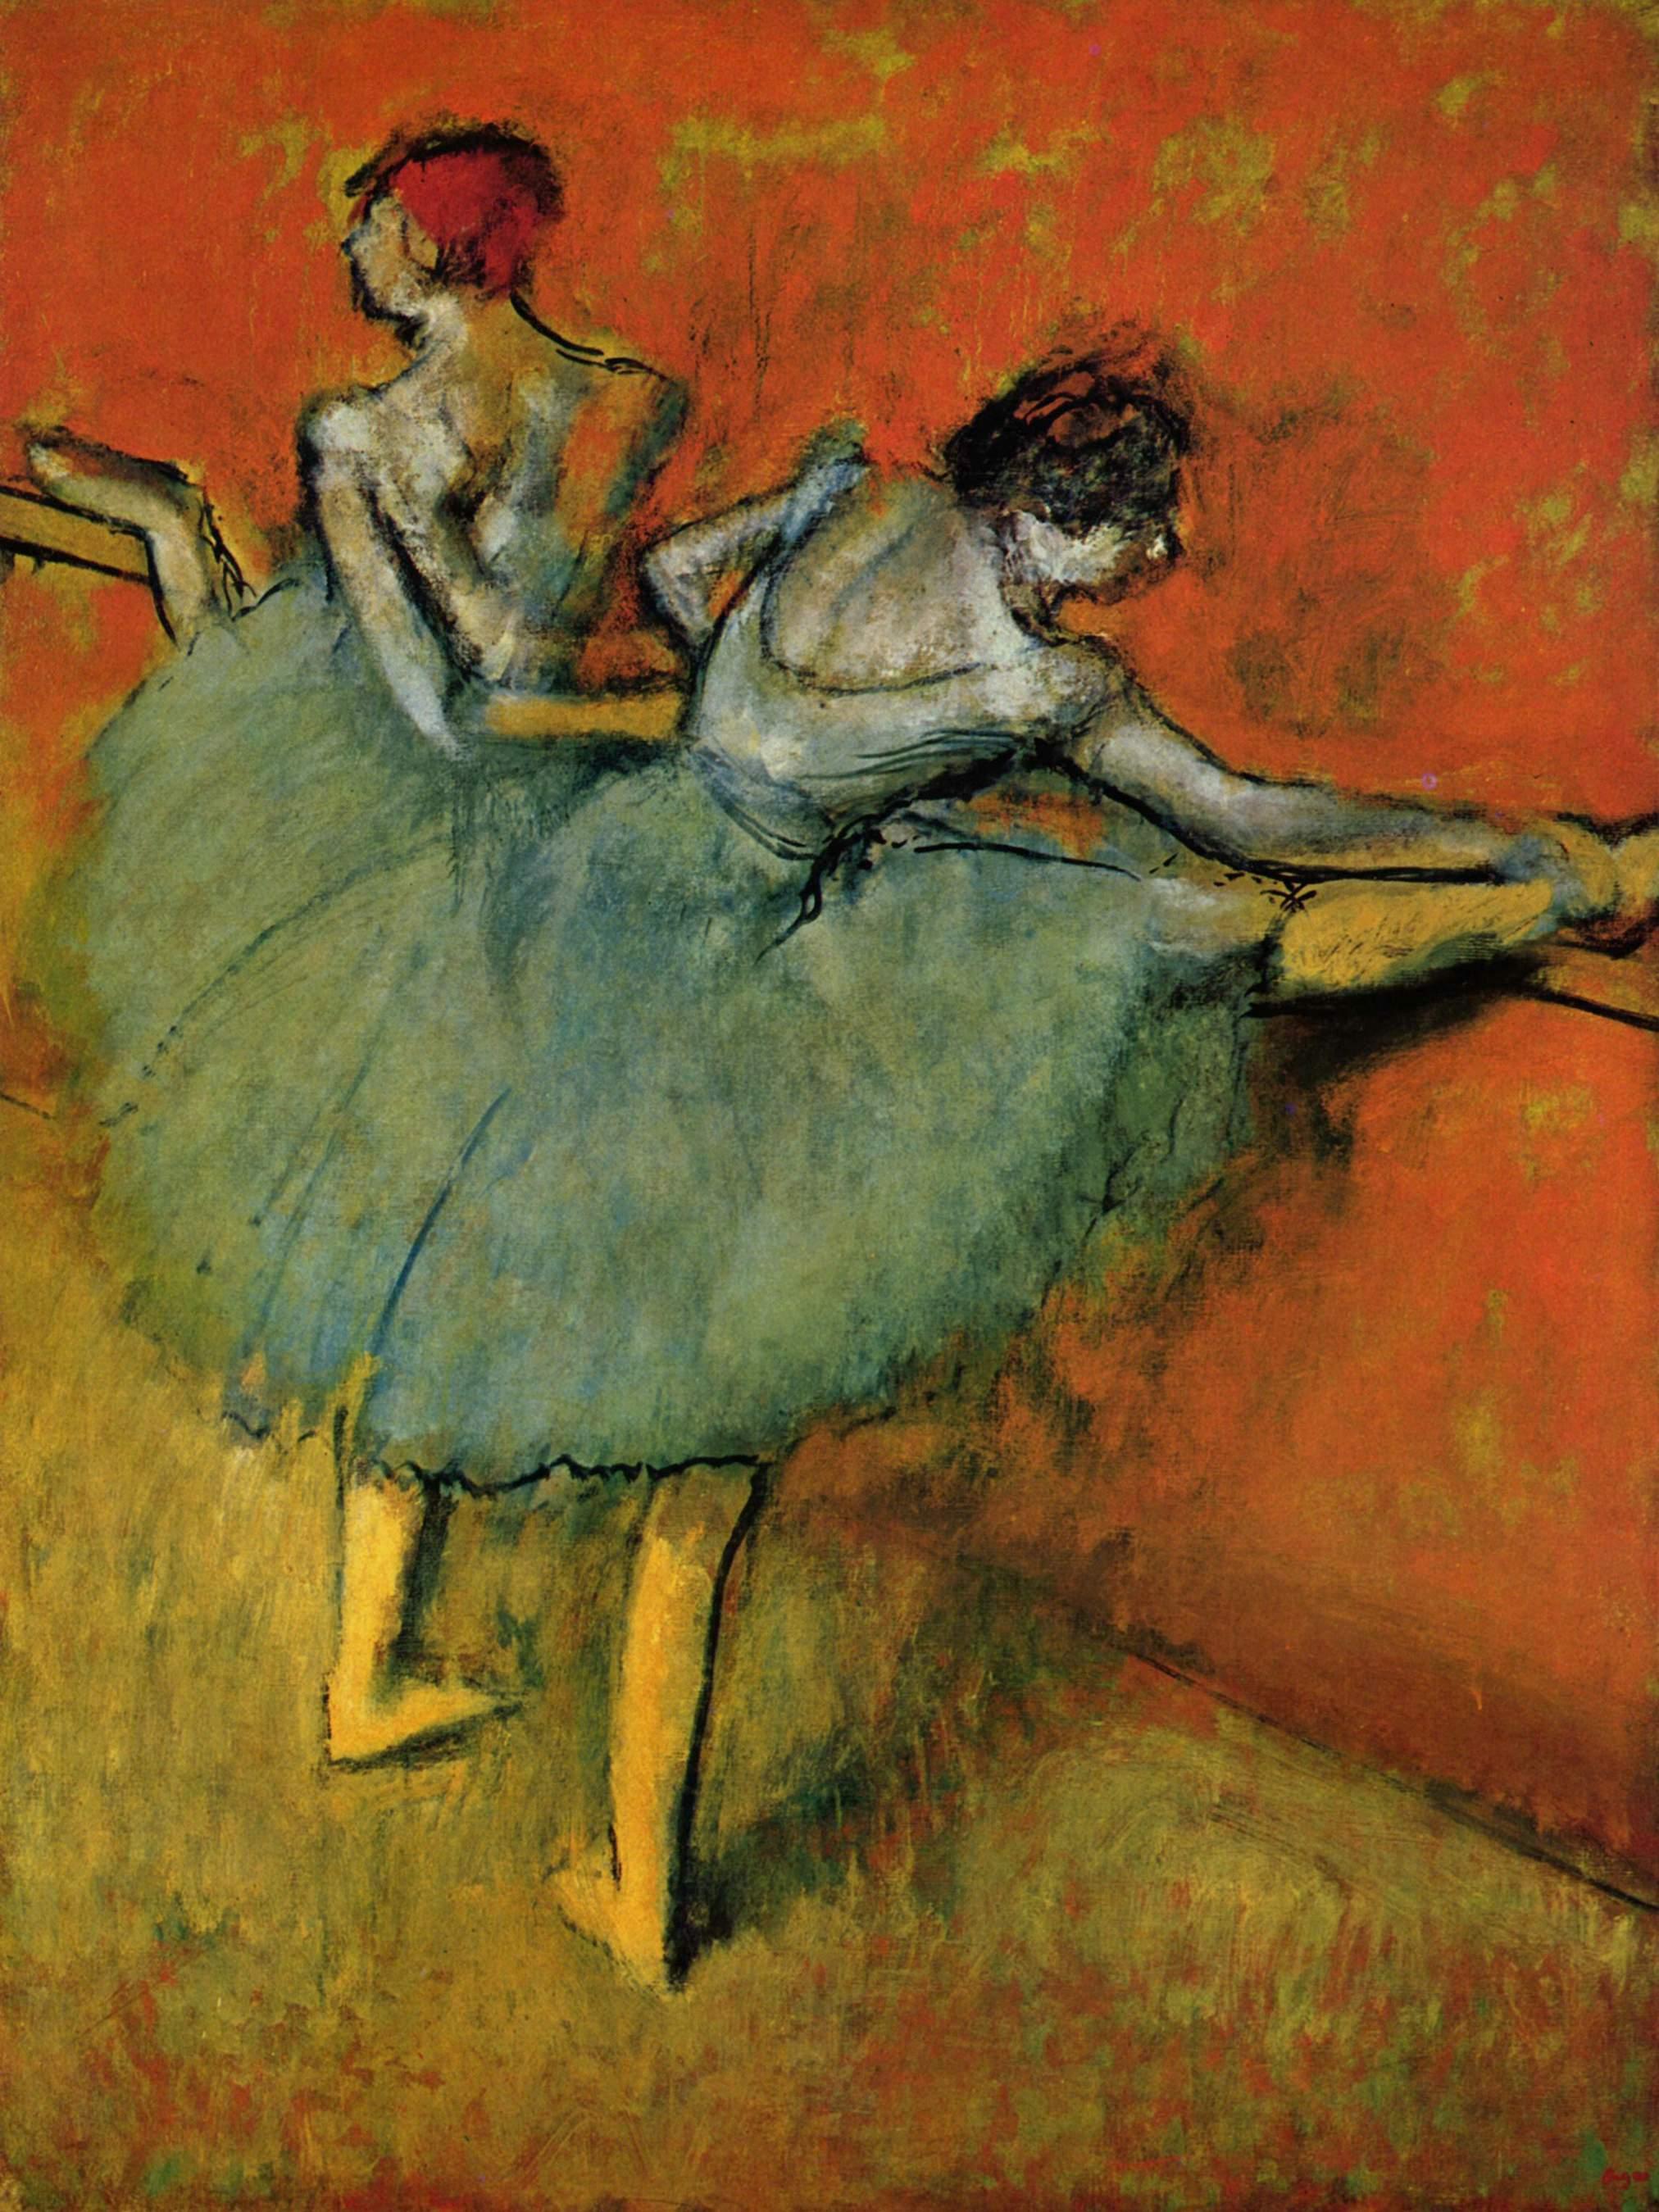 https://uploads2.wikiart.org/images/edgar-degas/dancers-at-the-barre.jpg